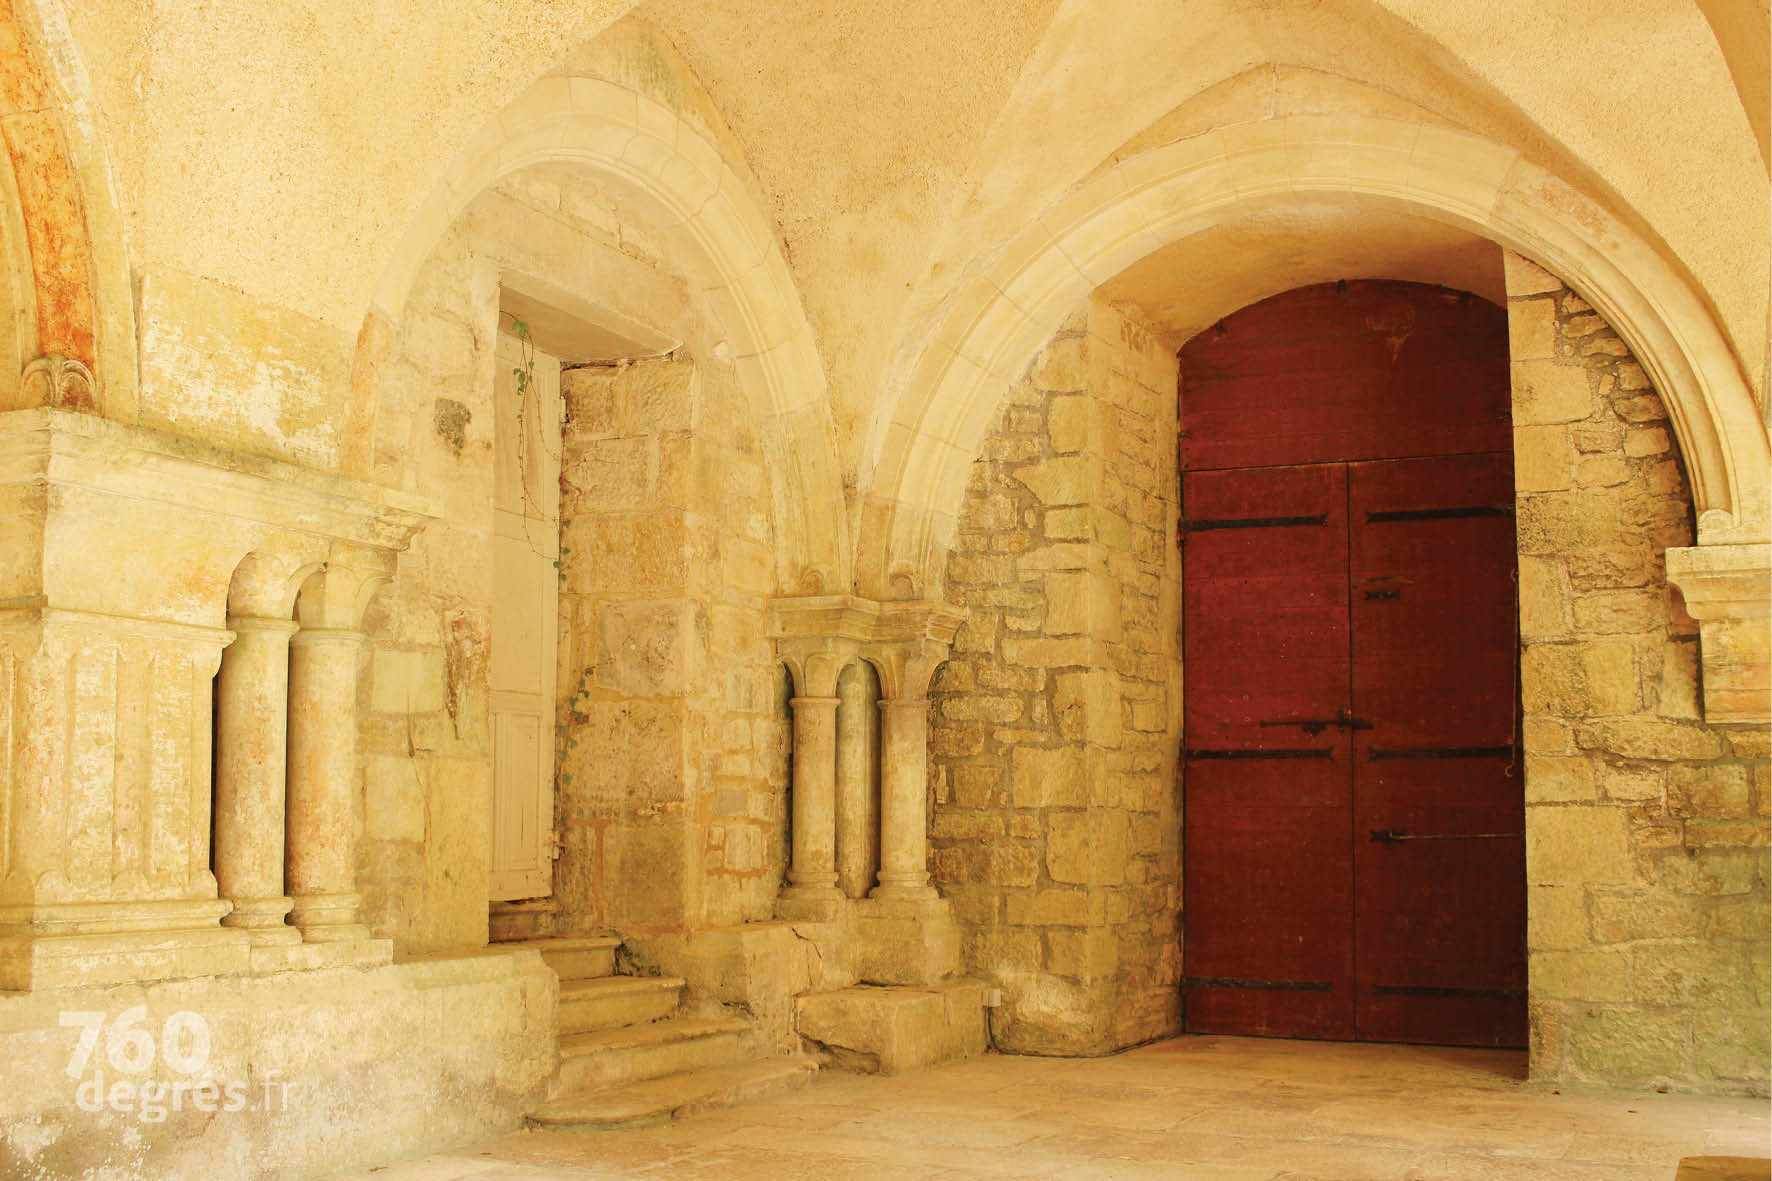 760degres-abbaye-fontenay-08